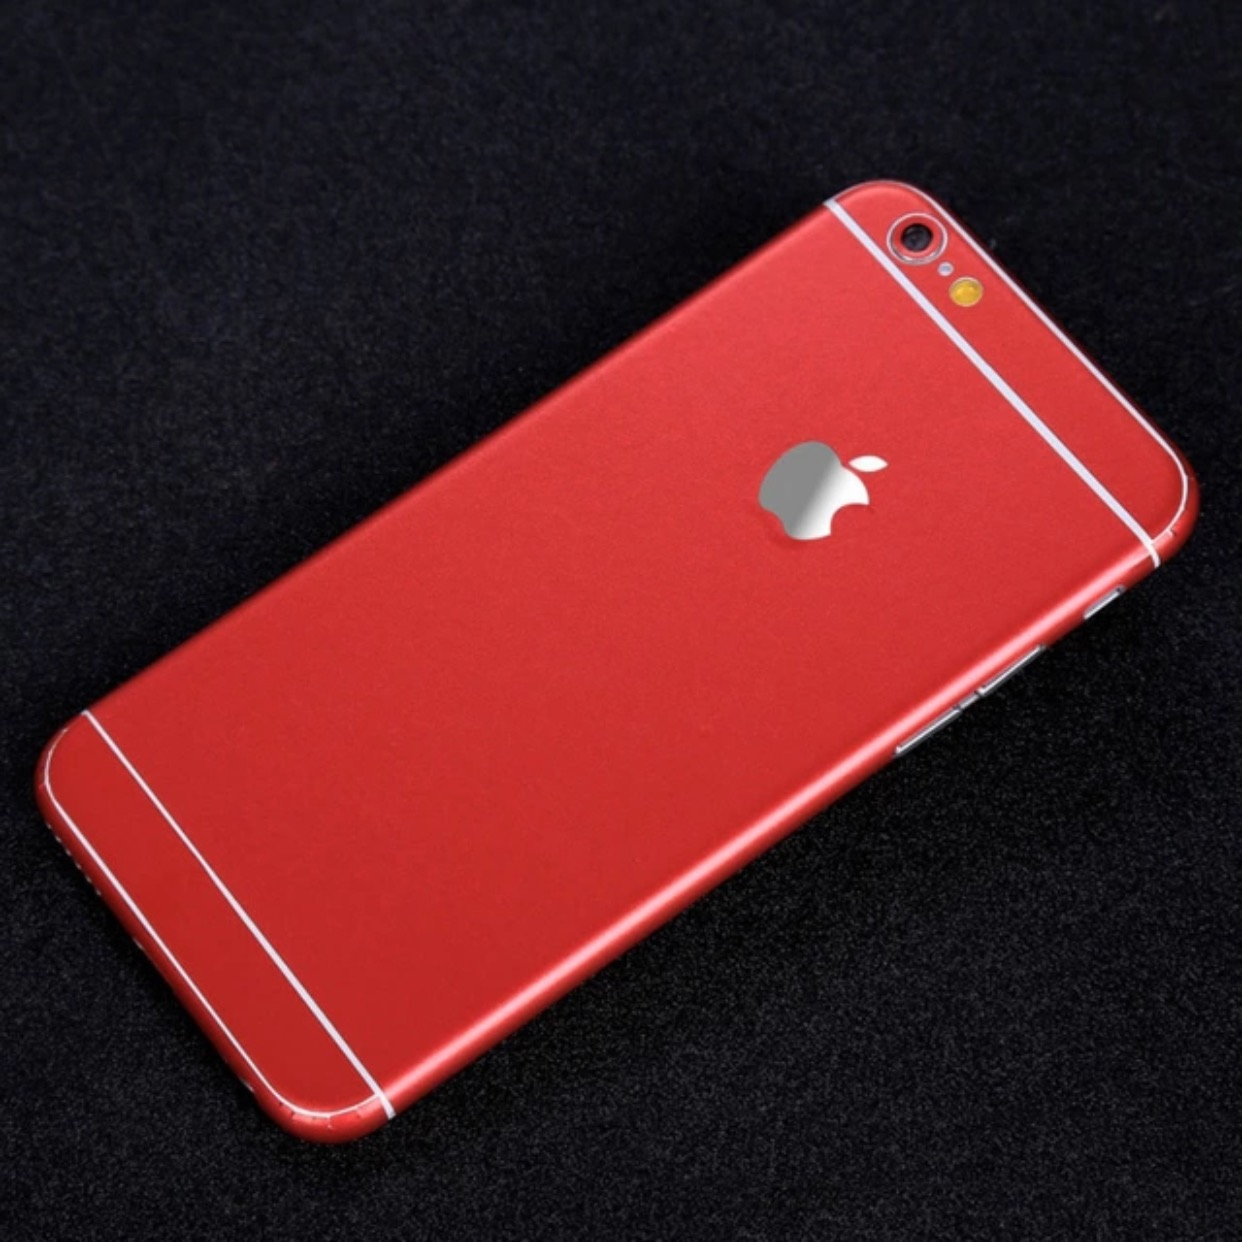 Matte Red iPhone Sticker Skin Cover